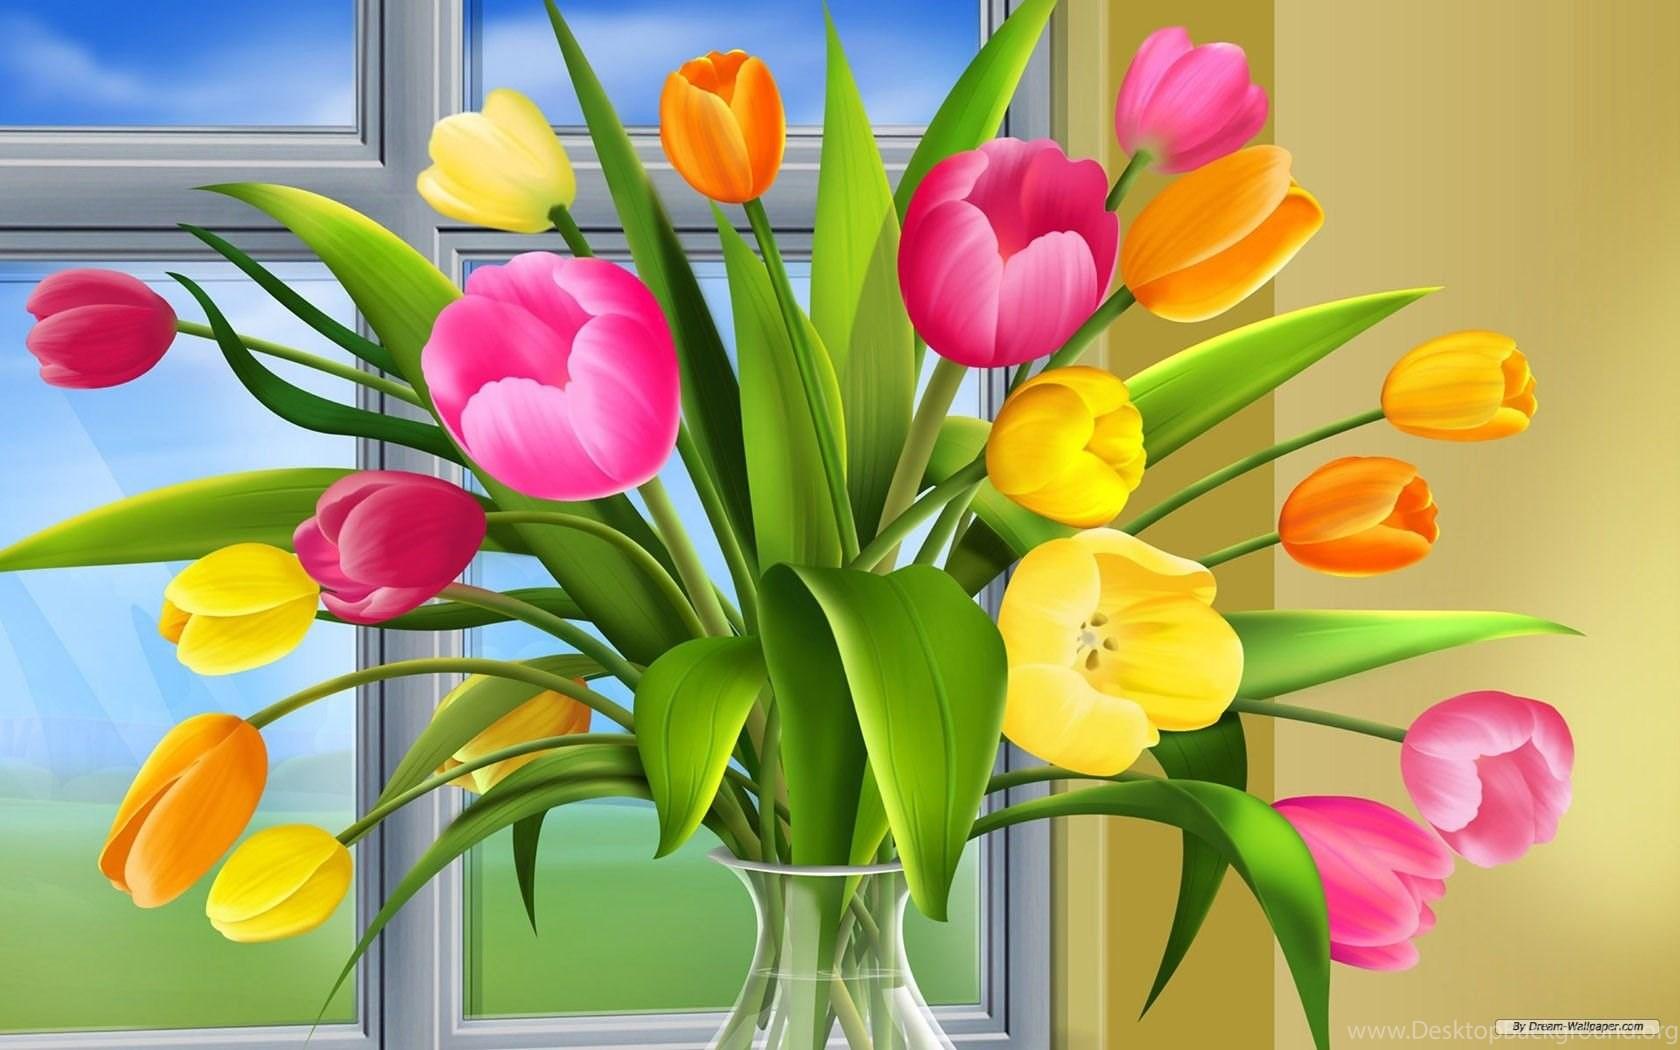 Free Easter Wallpapers Hd Wallpapers Desktop Wallpapers